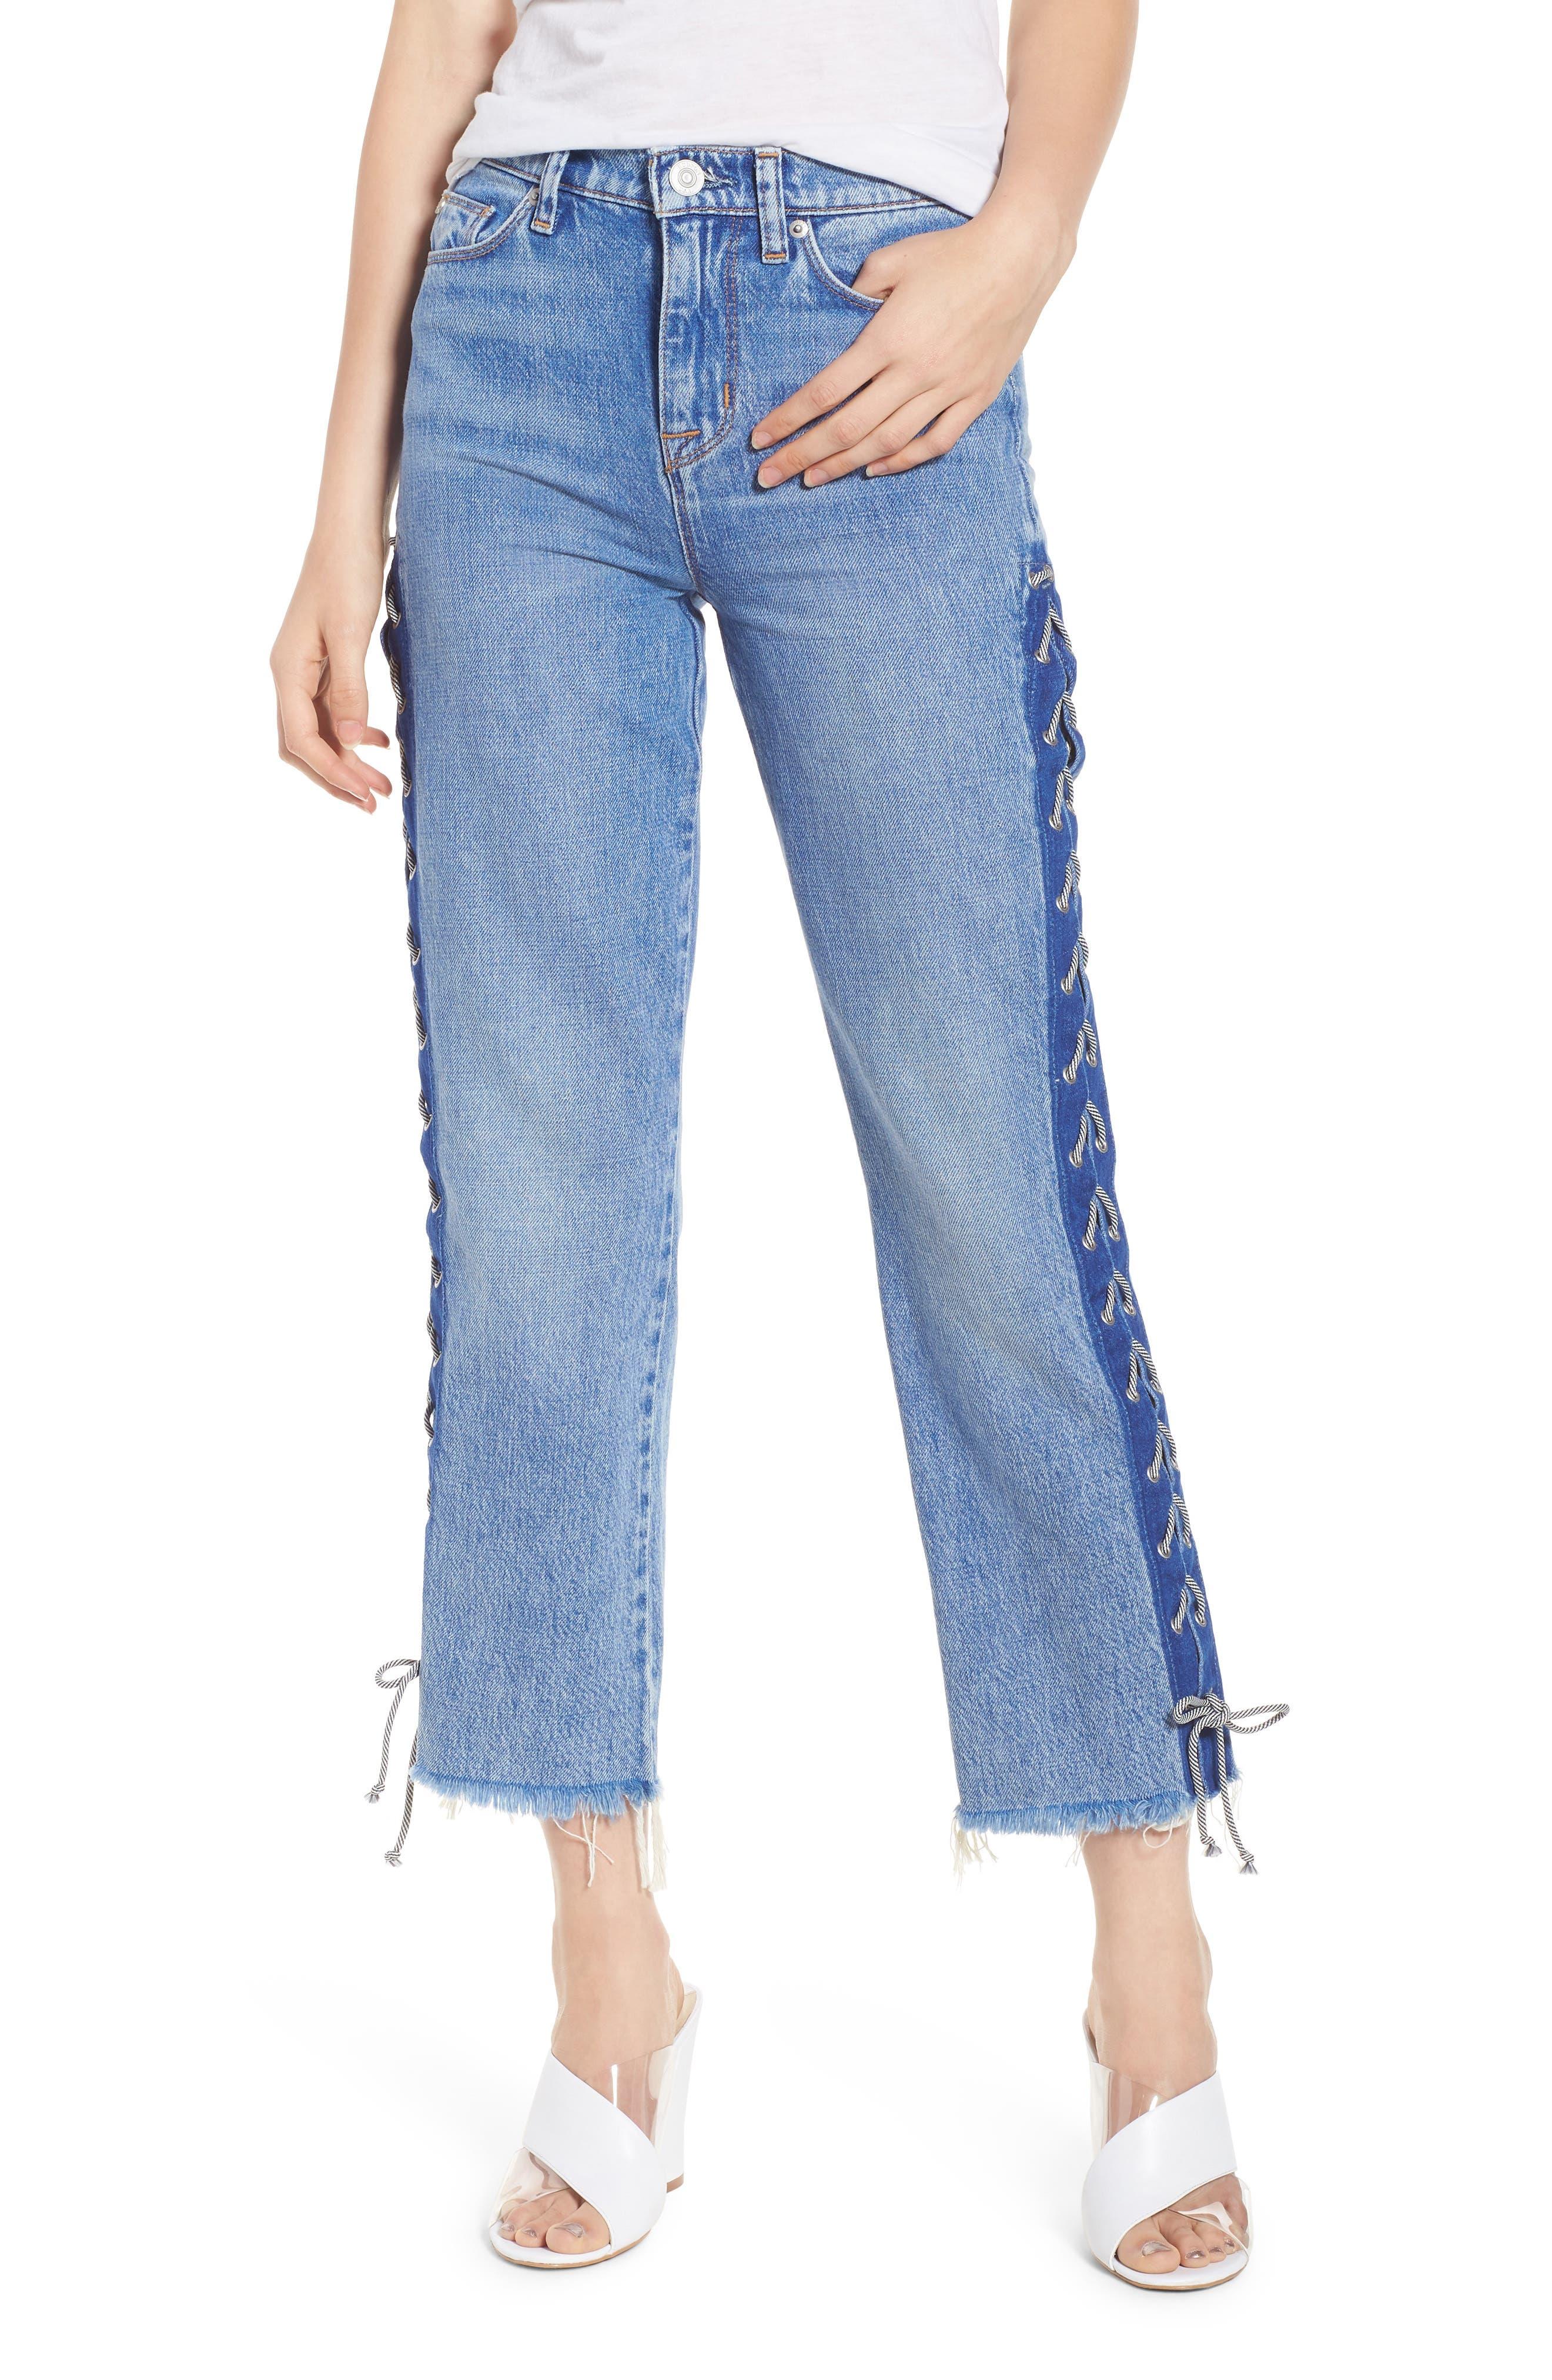 Zoeey High Waist Crop Straight Leg Jeans,                         Main,                         color, 460